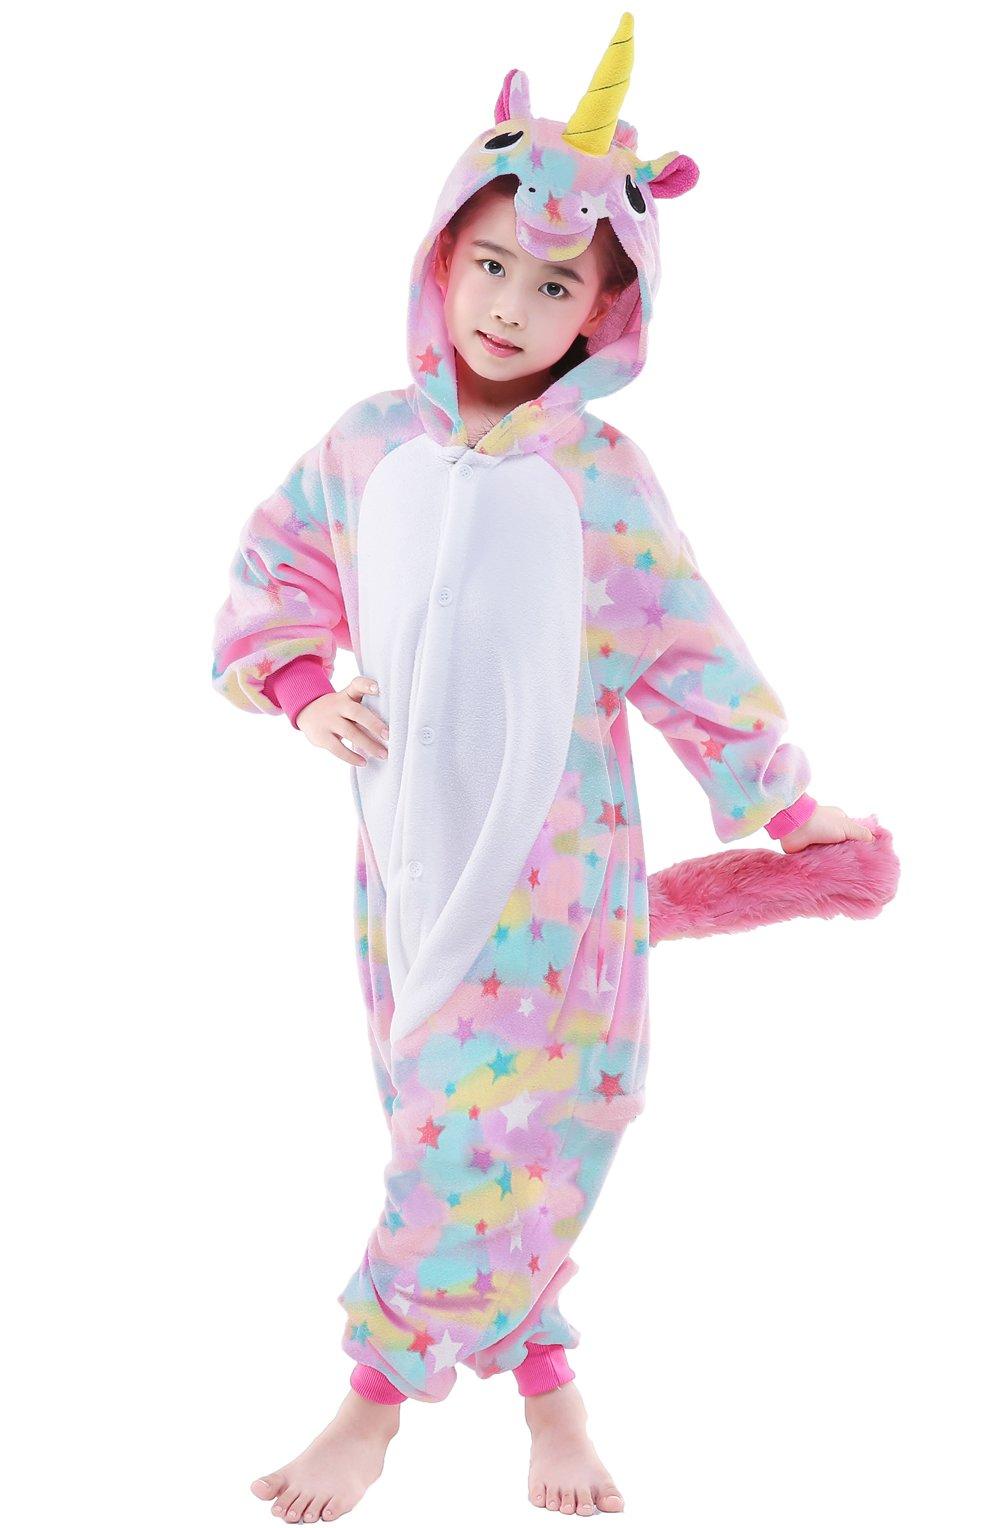 NEWCOSPLAY Cartoon Christmas Costumes Unisex Kids Unicorn Pajamas Gifts (115, color unicorn) by NEWCOSPLAY (Image #5)